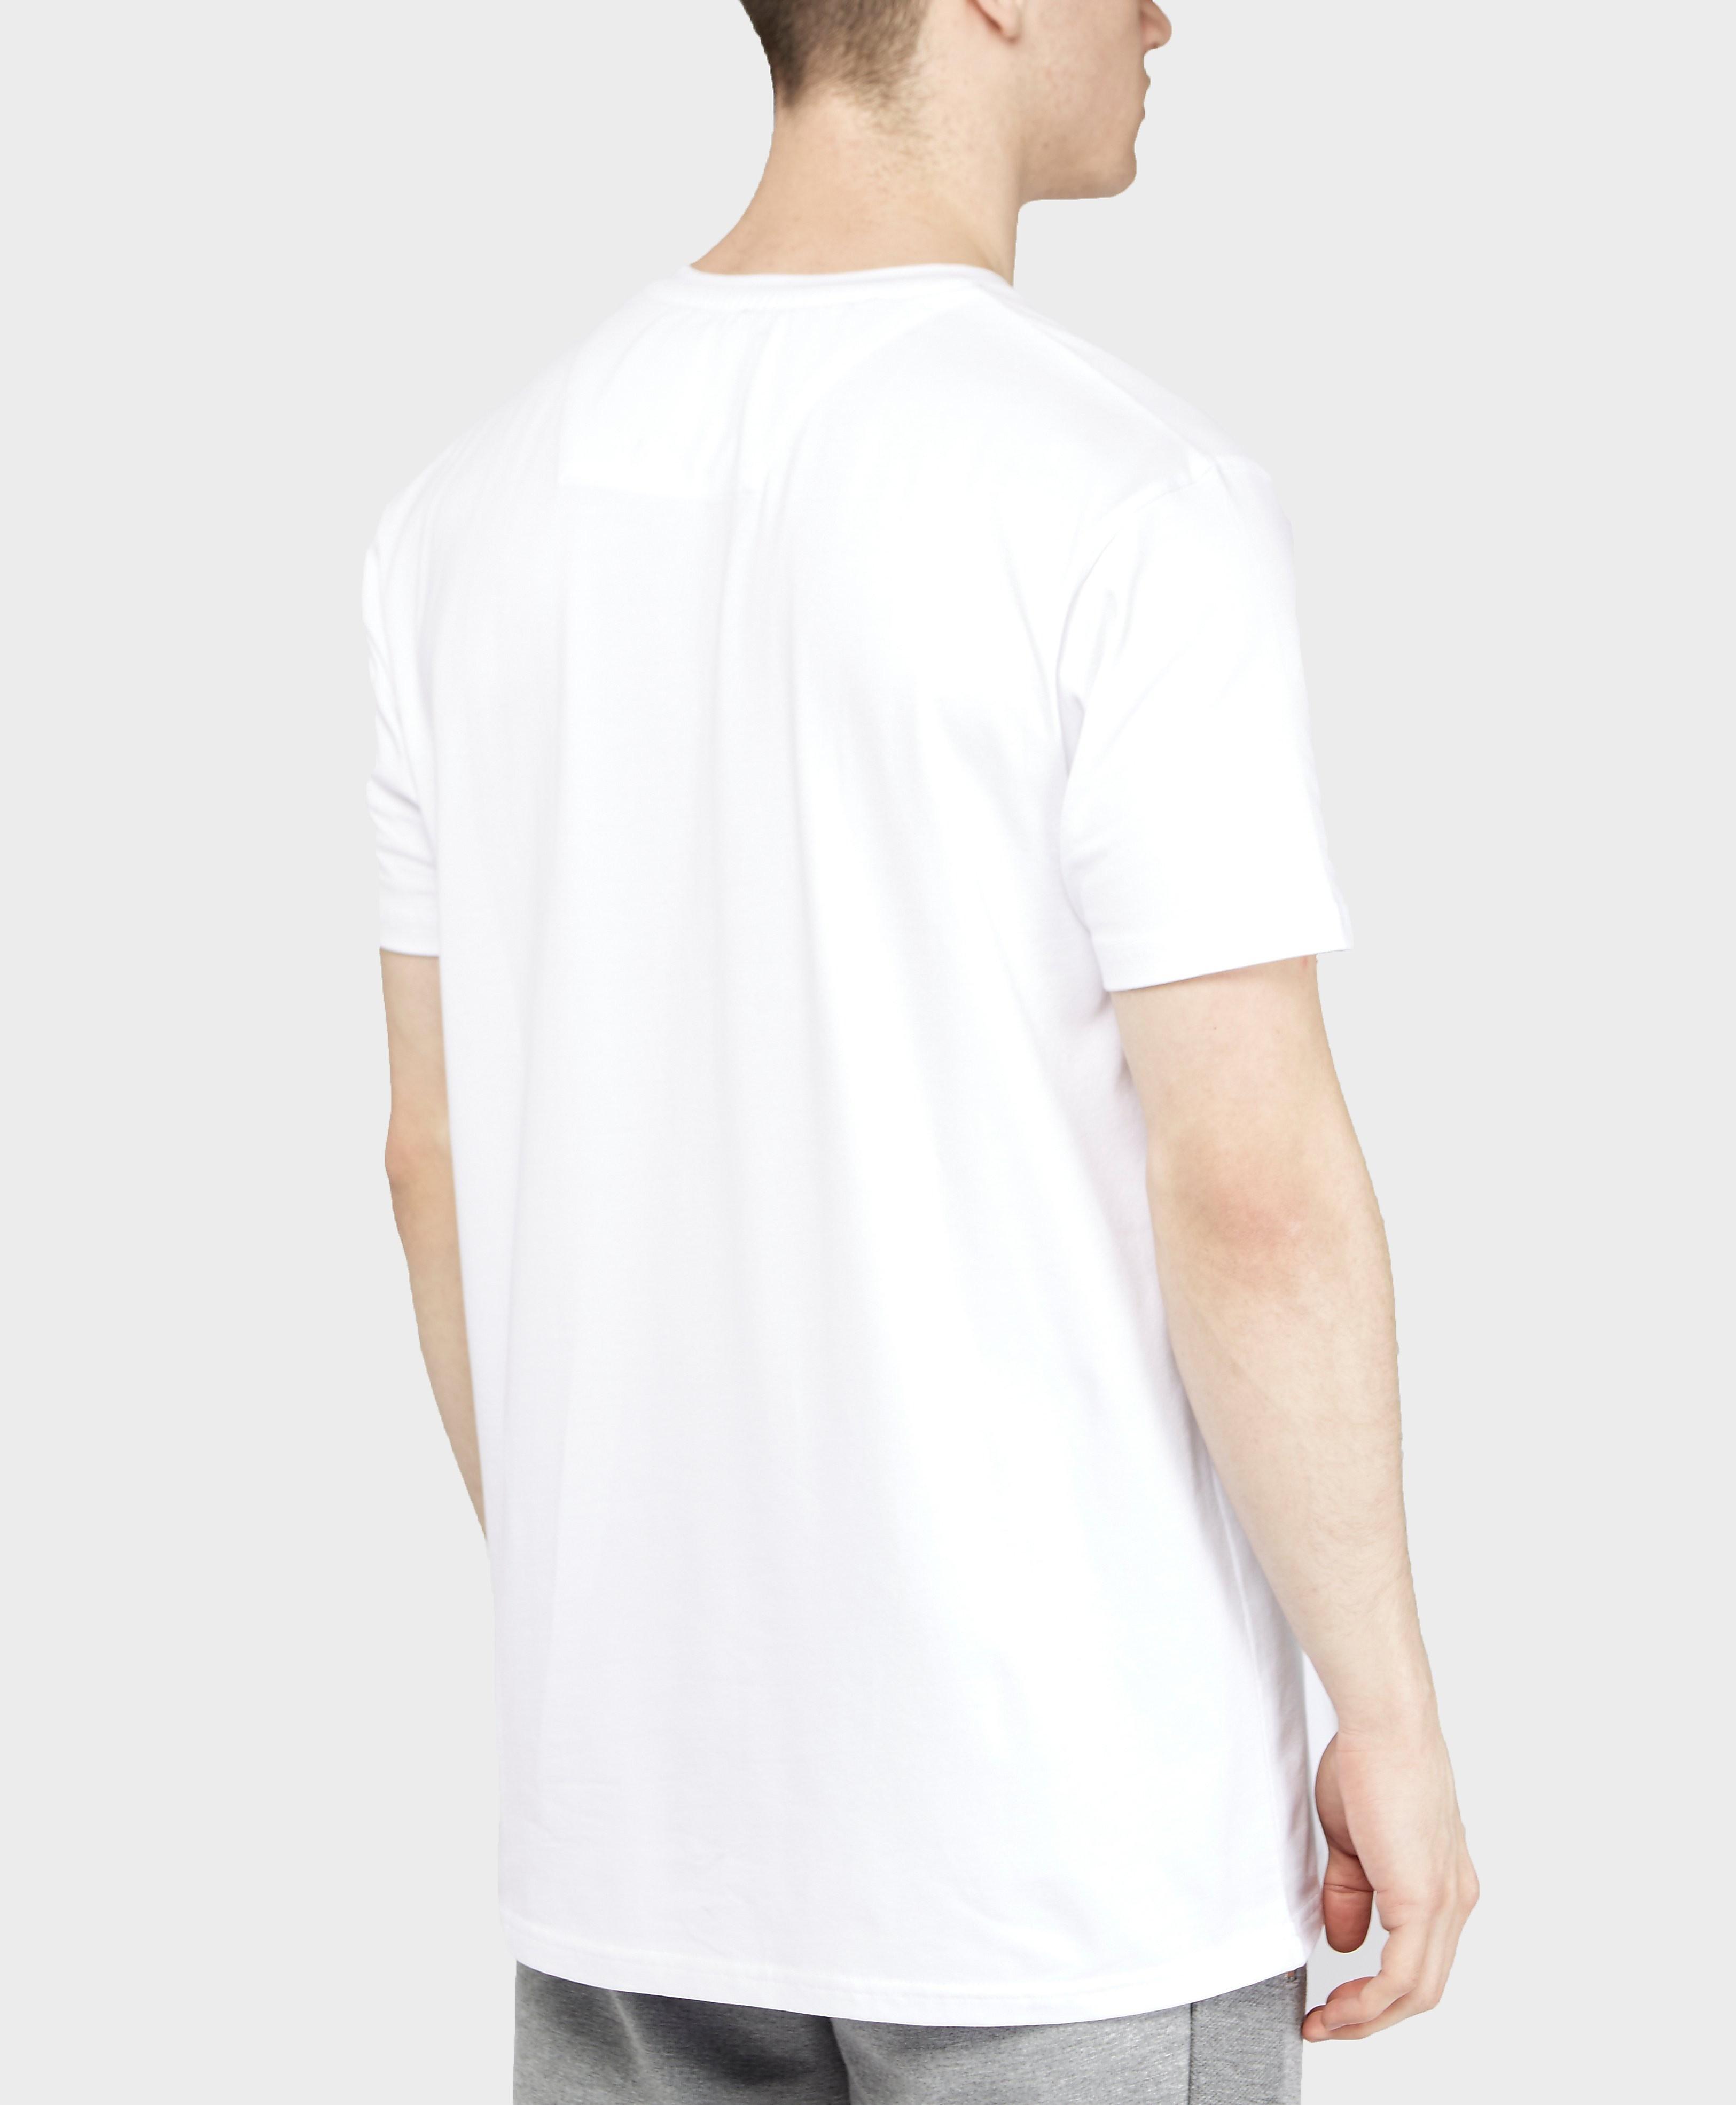 Cruyff Moreno Crew T-Shirt